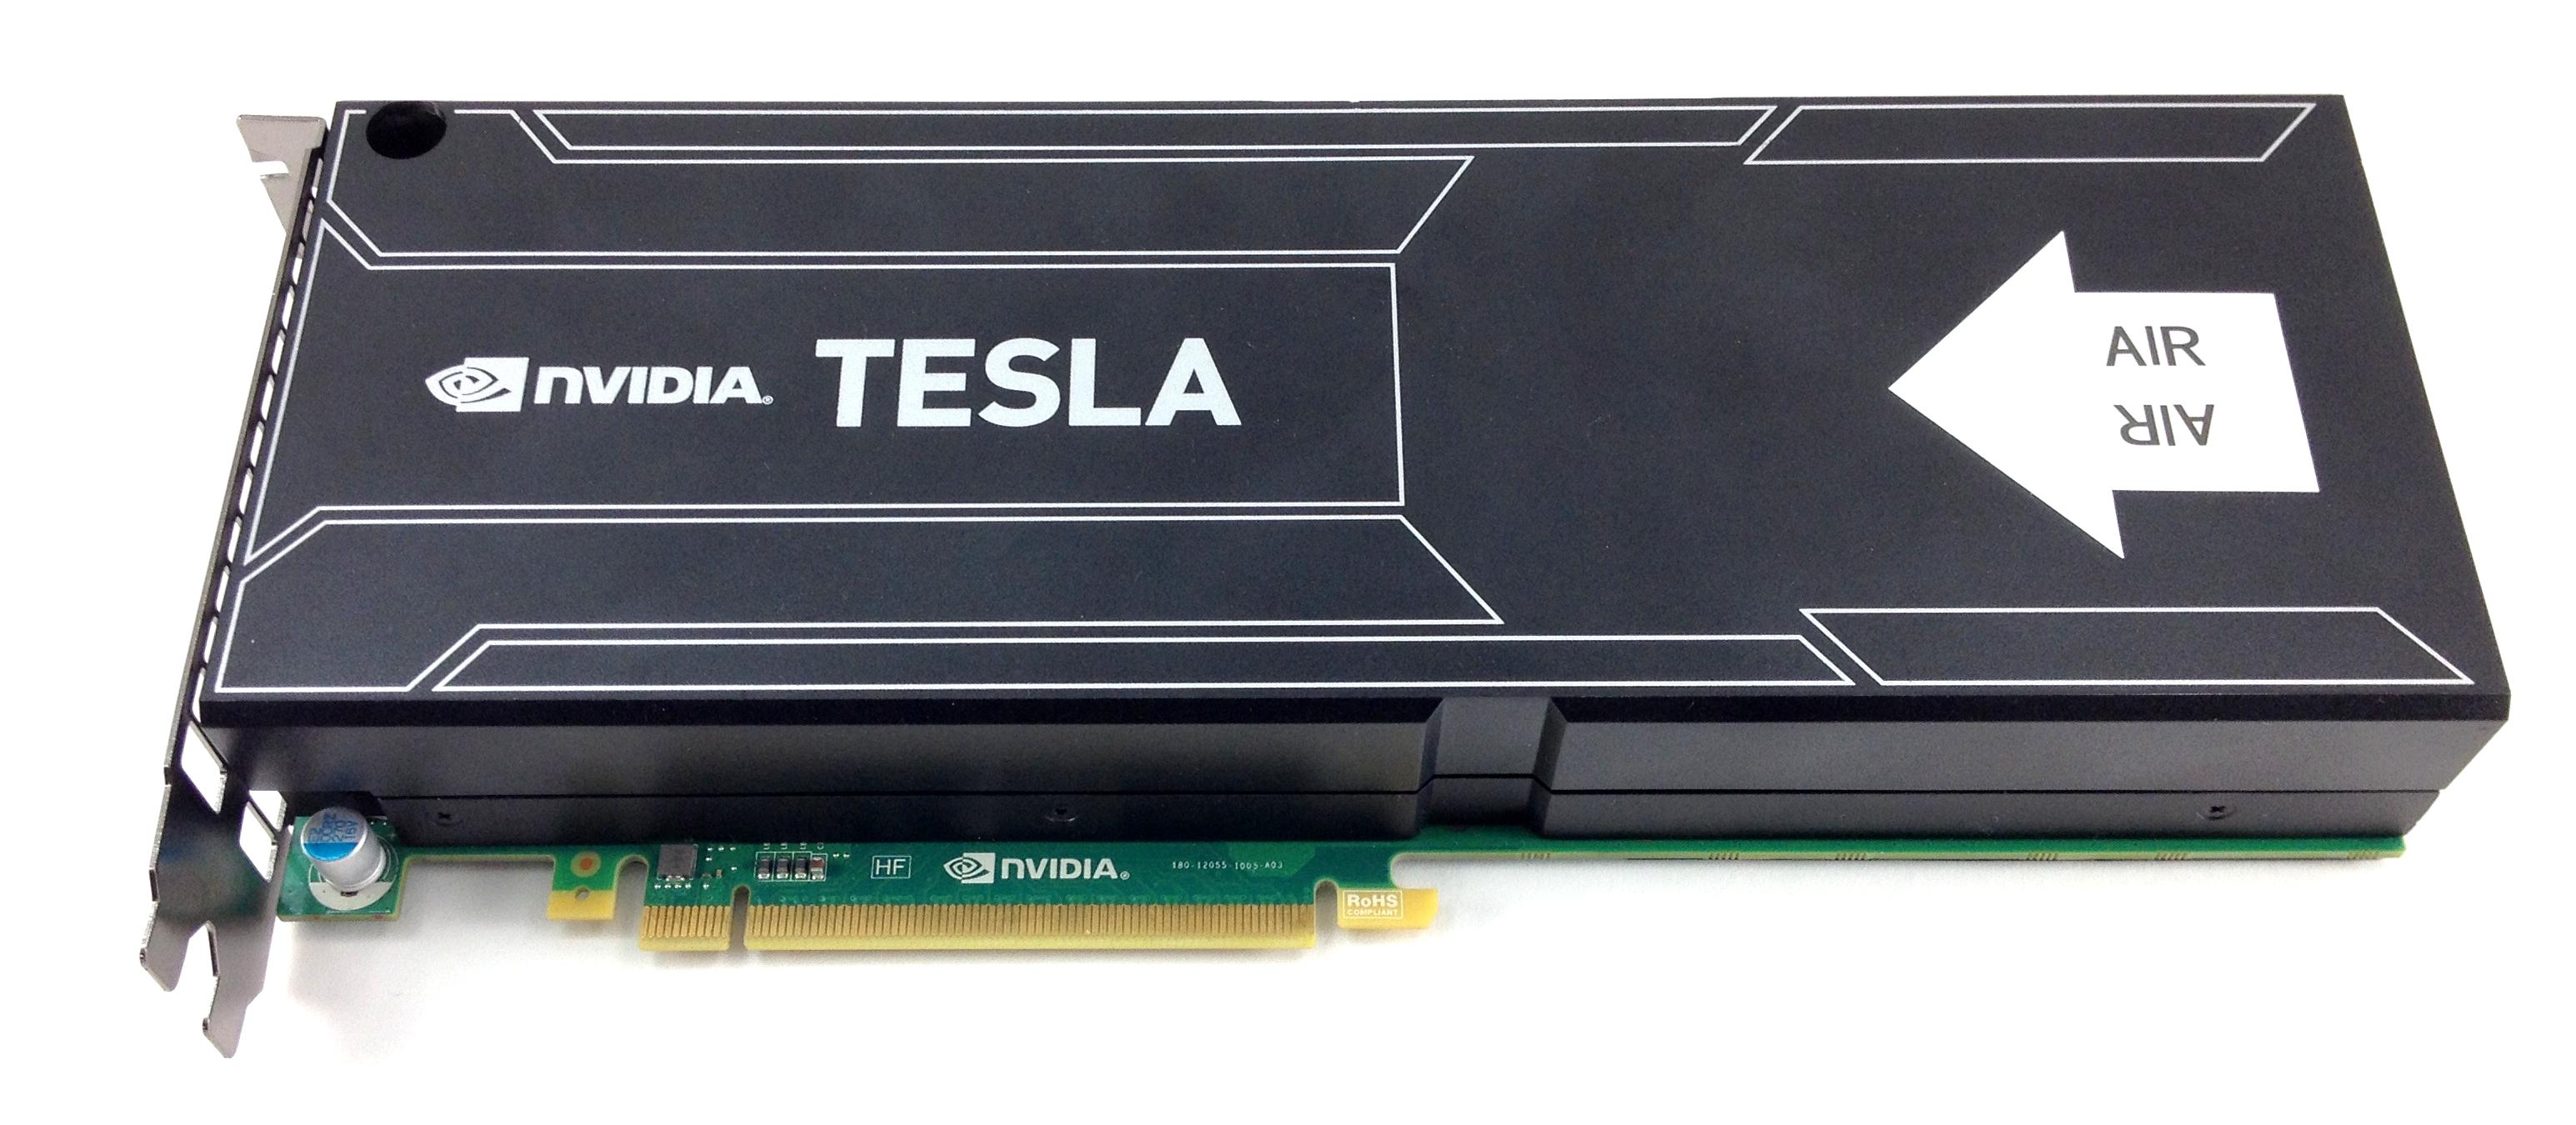 900-22055-0020-000 NVIDIA TESLA KEPLER K10 8GB GDDR5 GPU ACCELERATOR